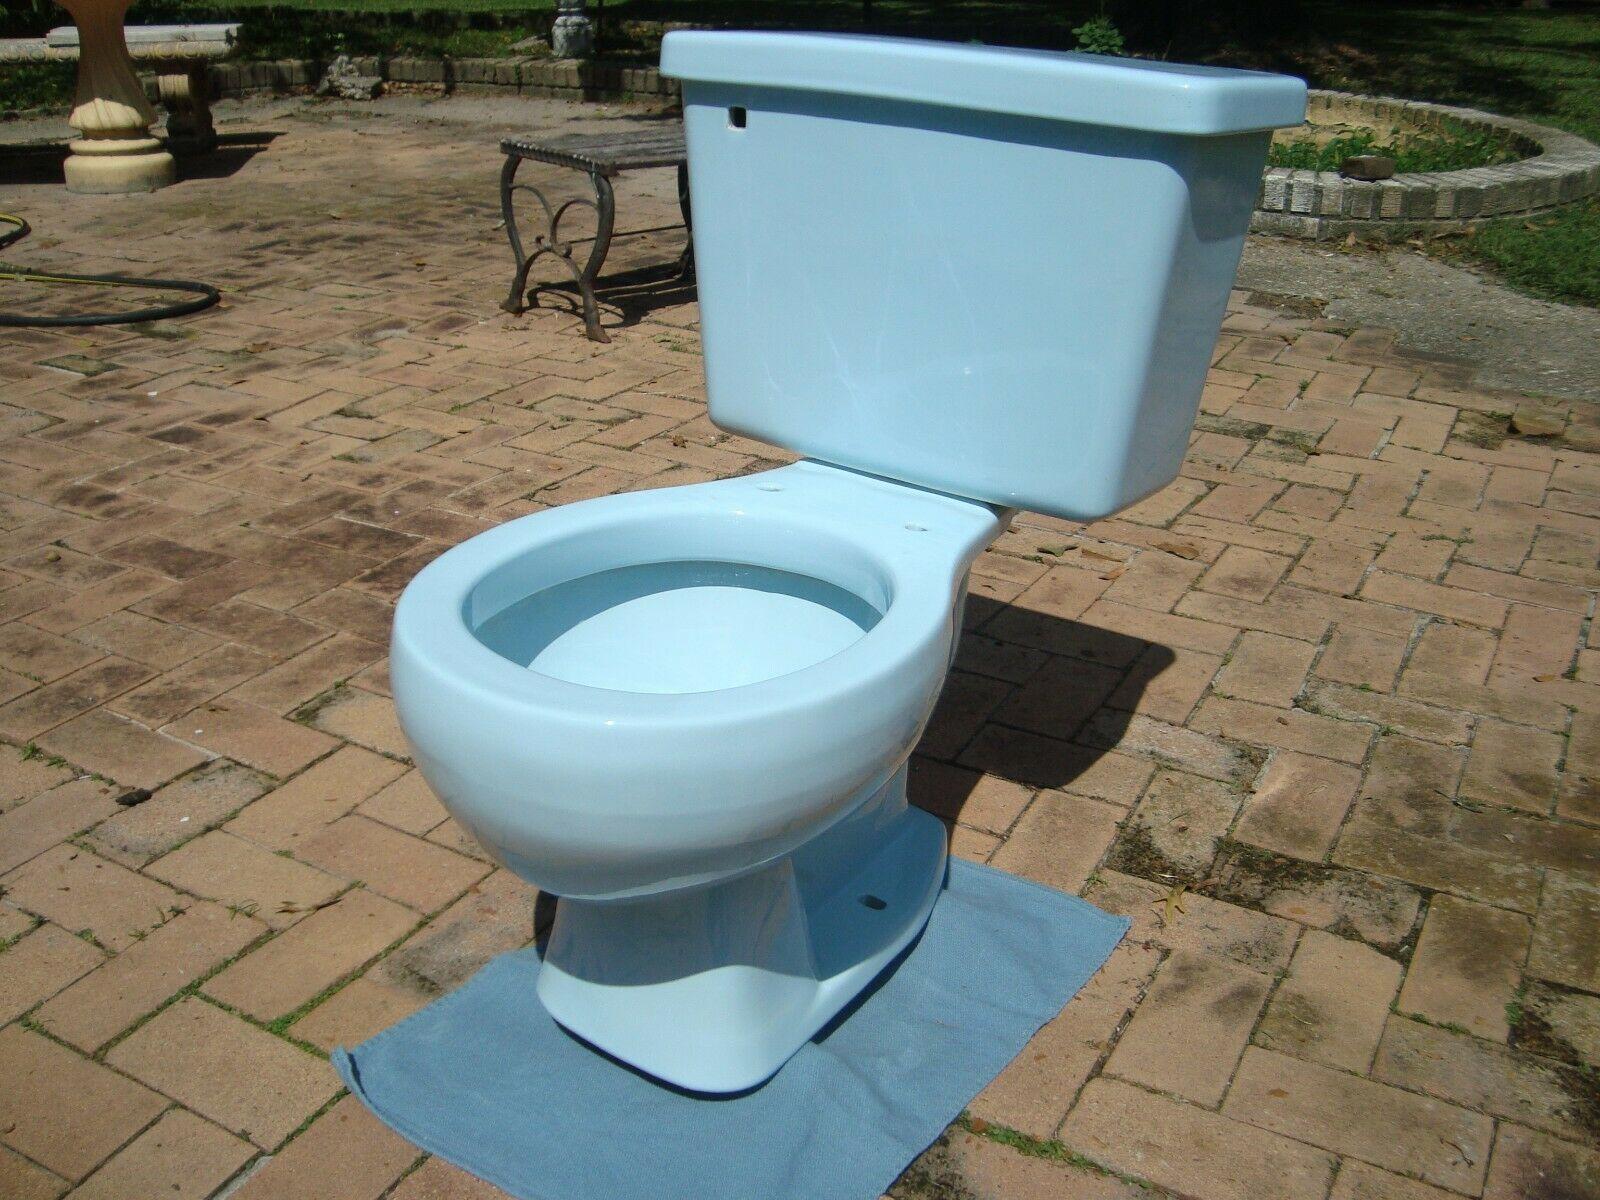 Https Ift Tt 2p6mikr Toilets Ideas Of Toilets Toilets Briggs 4830 Light Blue Toilet Retro Briggs 4830 Toilet Toilet Toto Toilet Pink Toilet